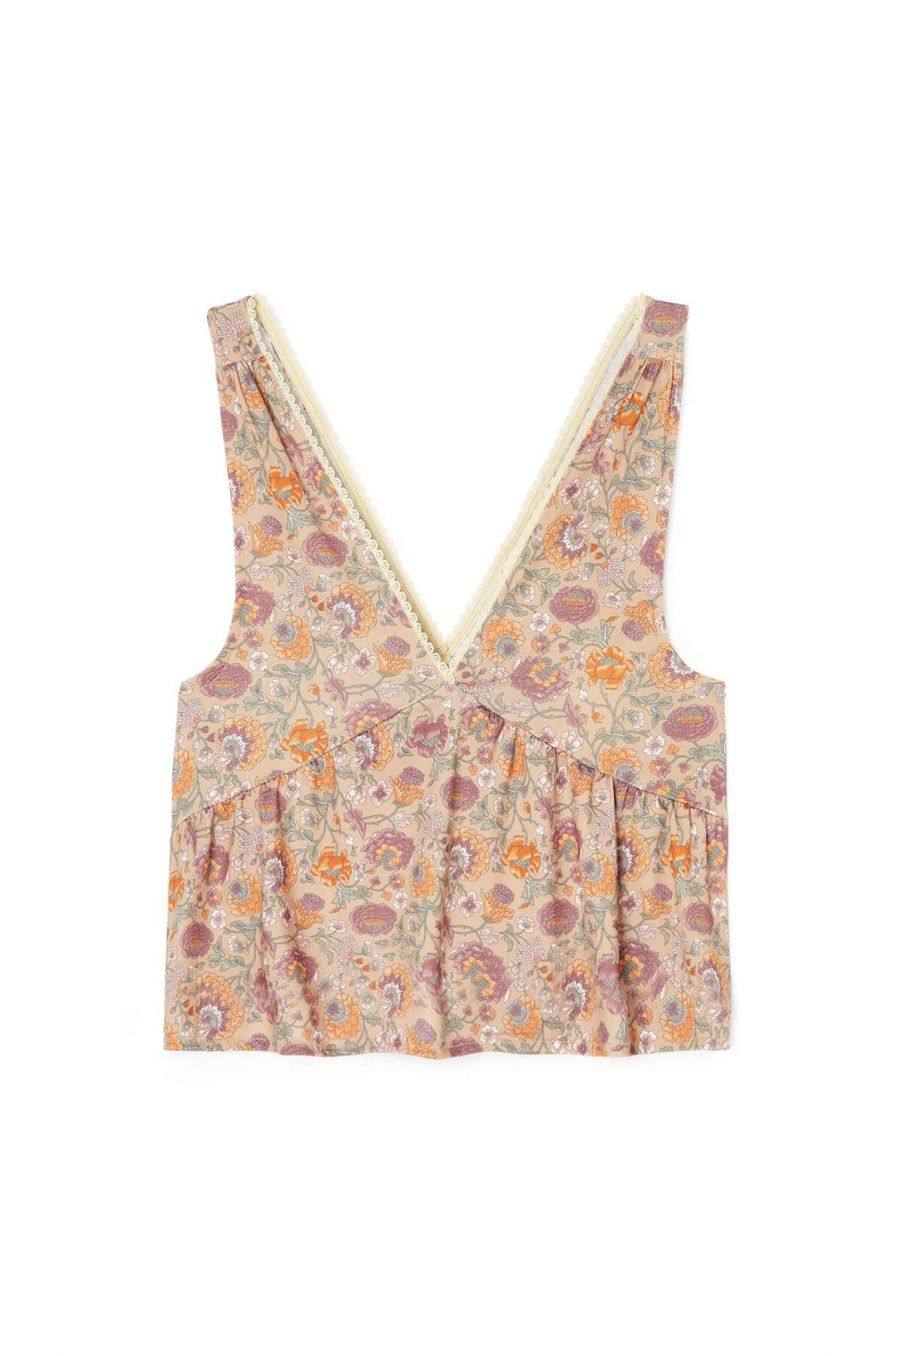 haut de pyjama femme lola sand bohemian flowers - louise misha